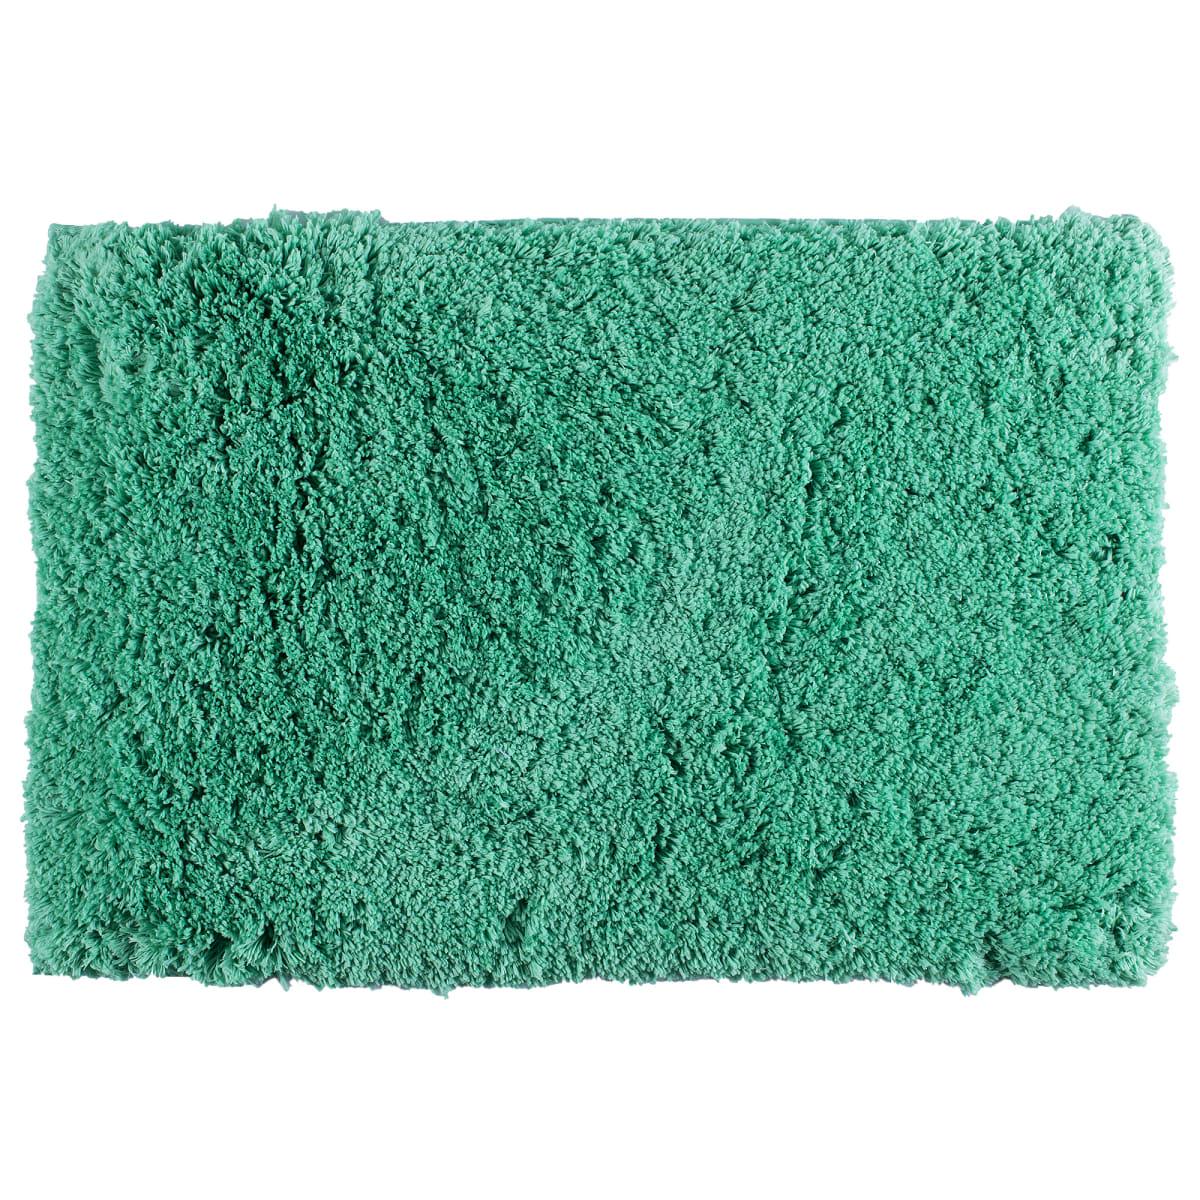 Коврик для ванной комнаты 60х90 см цвет зелёный